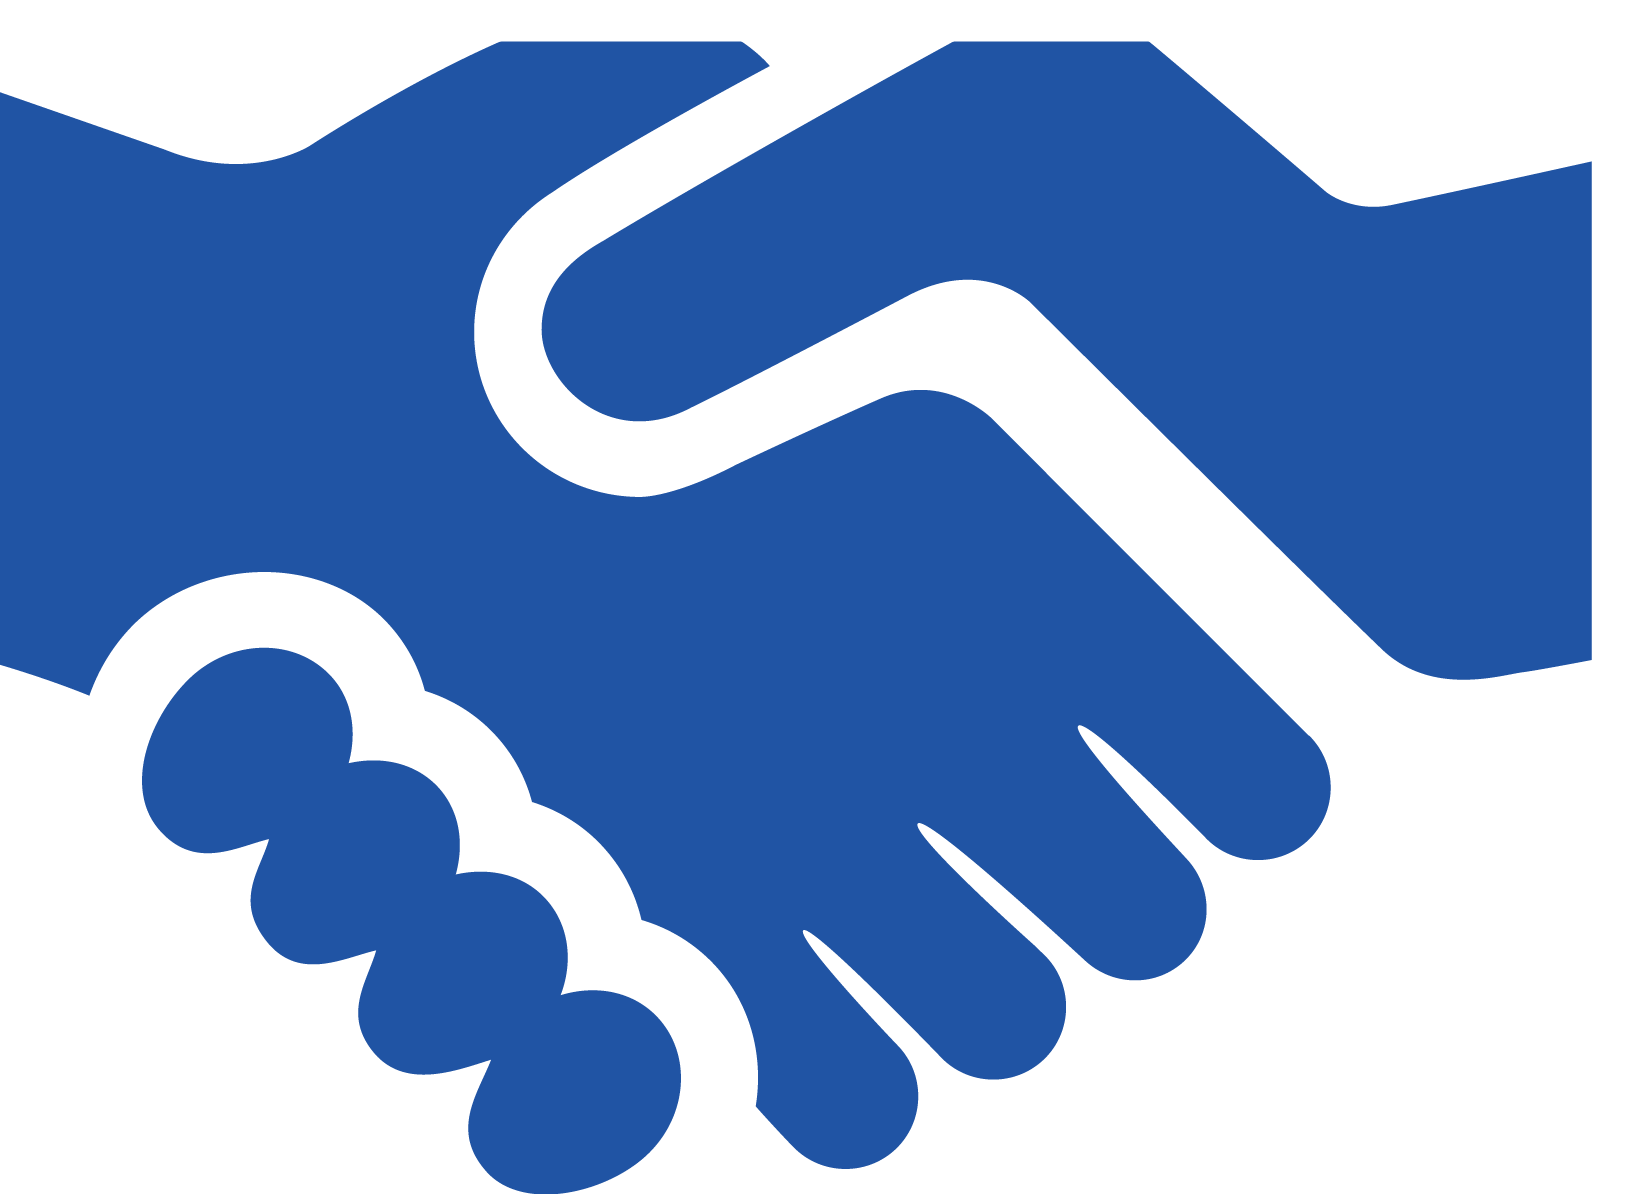 Handshake clipart group. Shaking hands pierce benefits